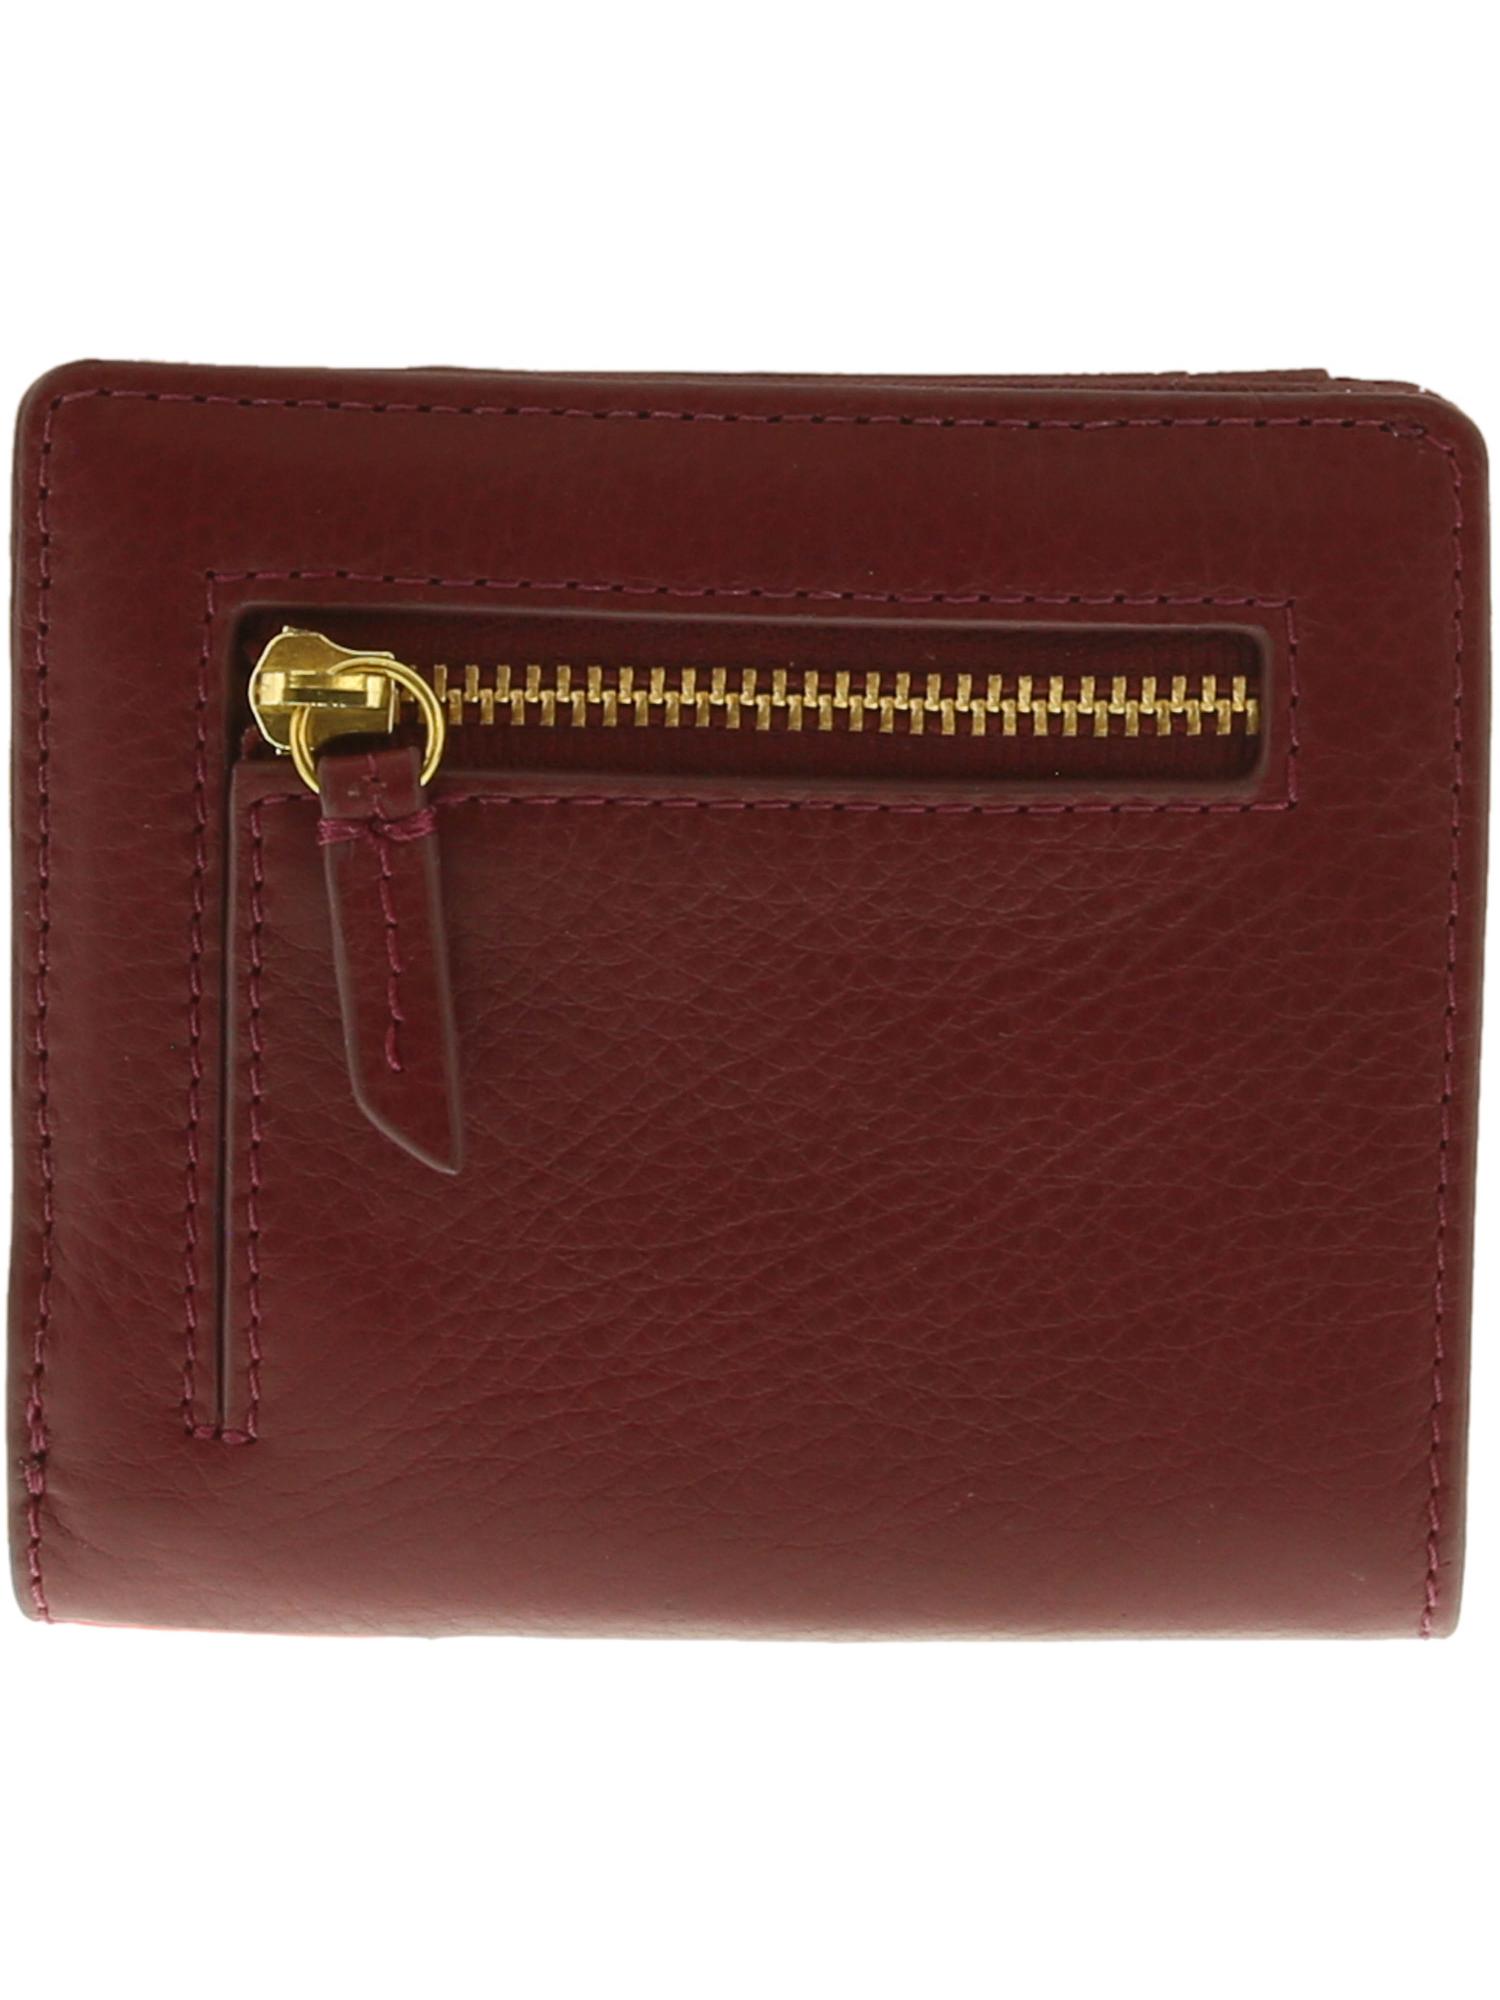 Fossil-Women-039-s-Emma-Rfid-Mini-Leather-Wallet thumbnail 29